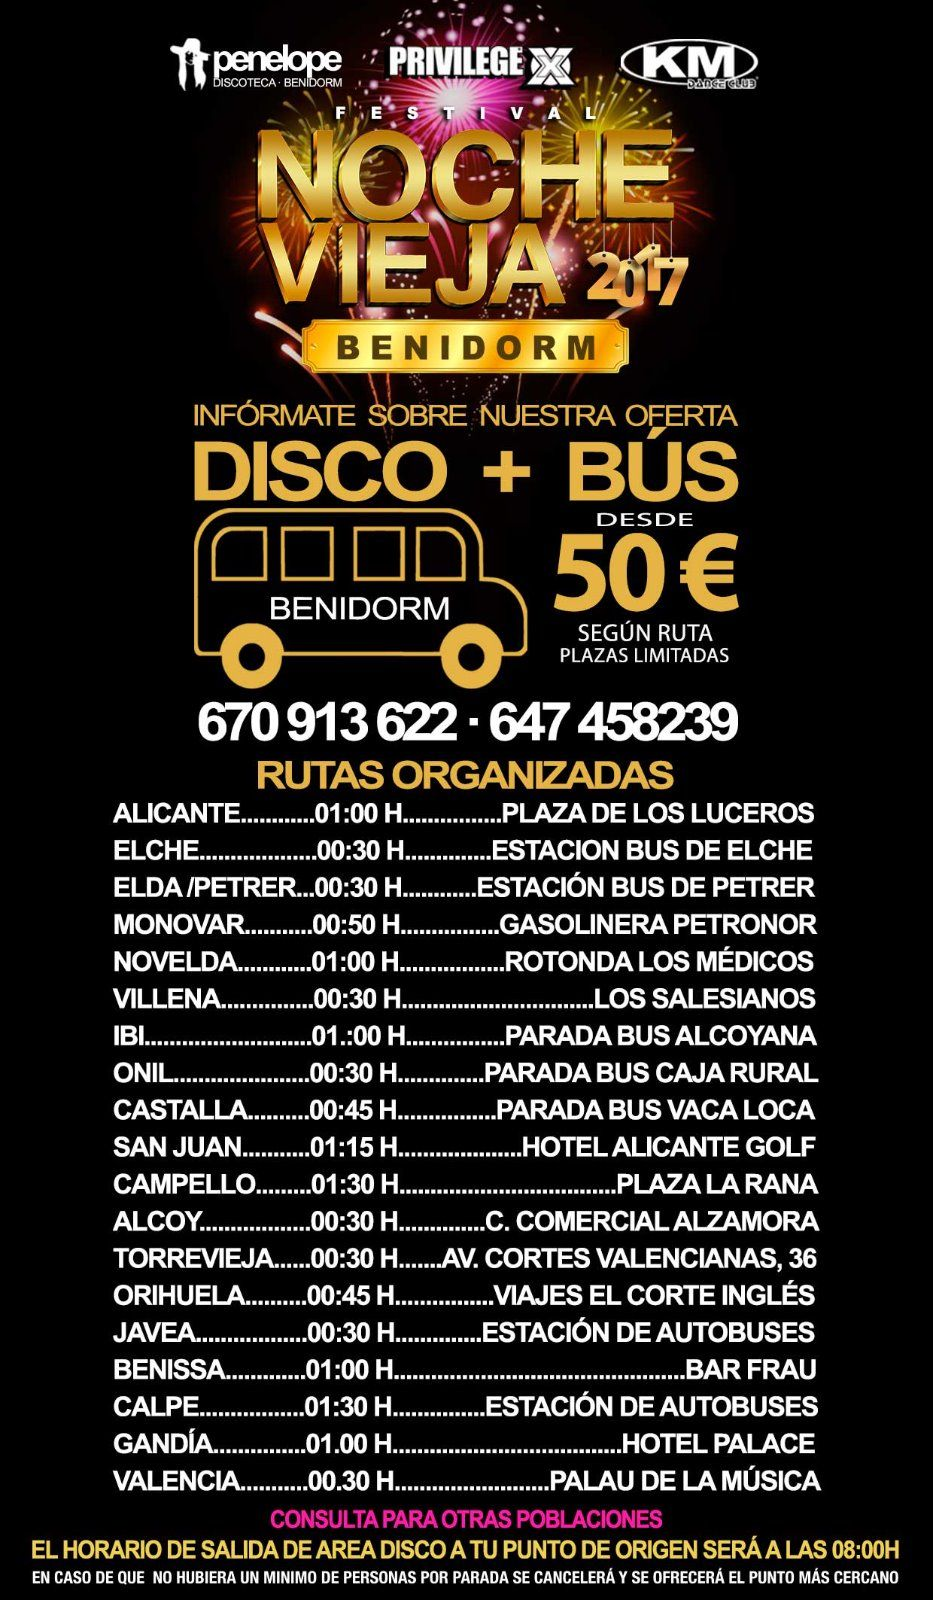 bus nochevieja benidorm 2017, Area Disco